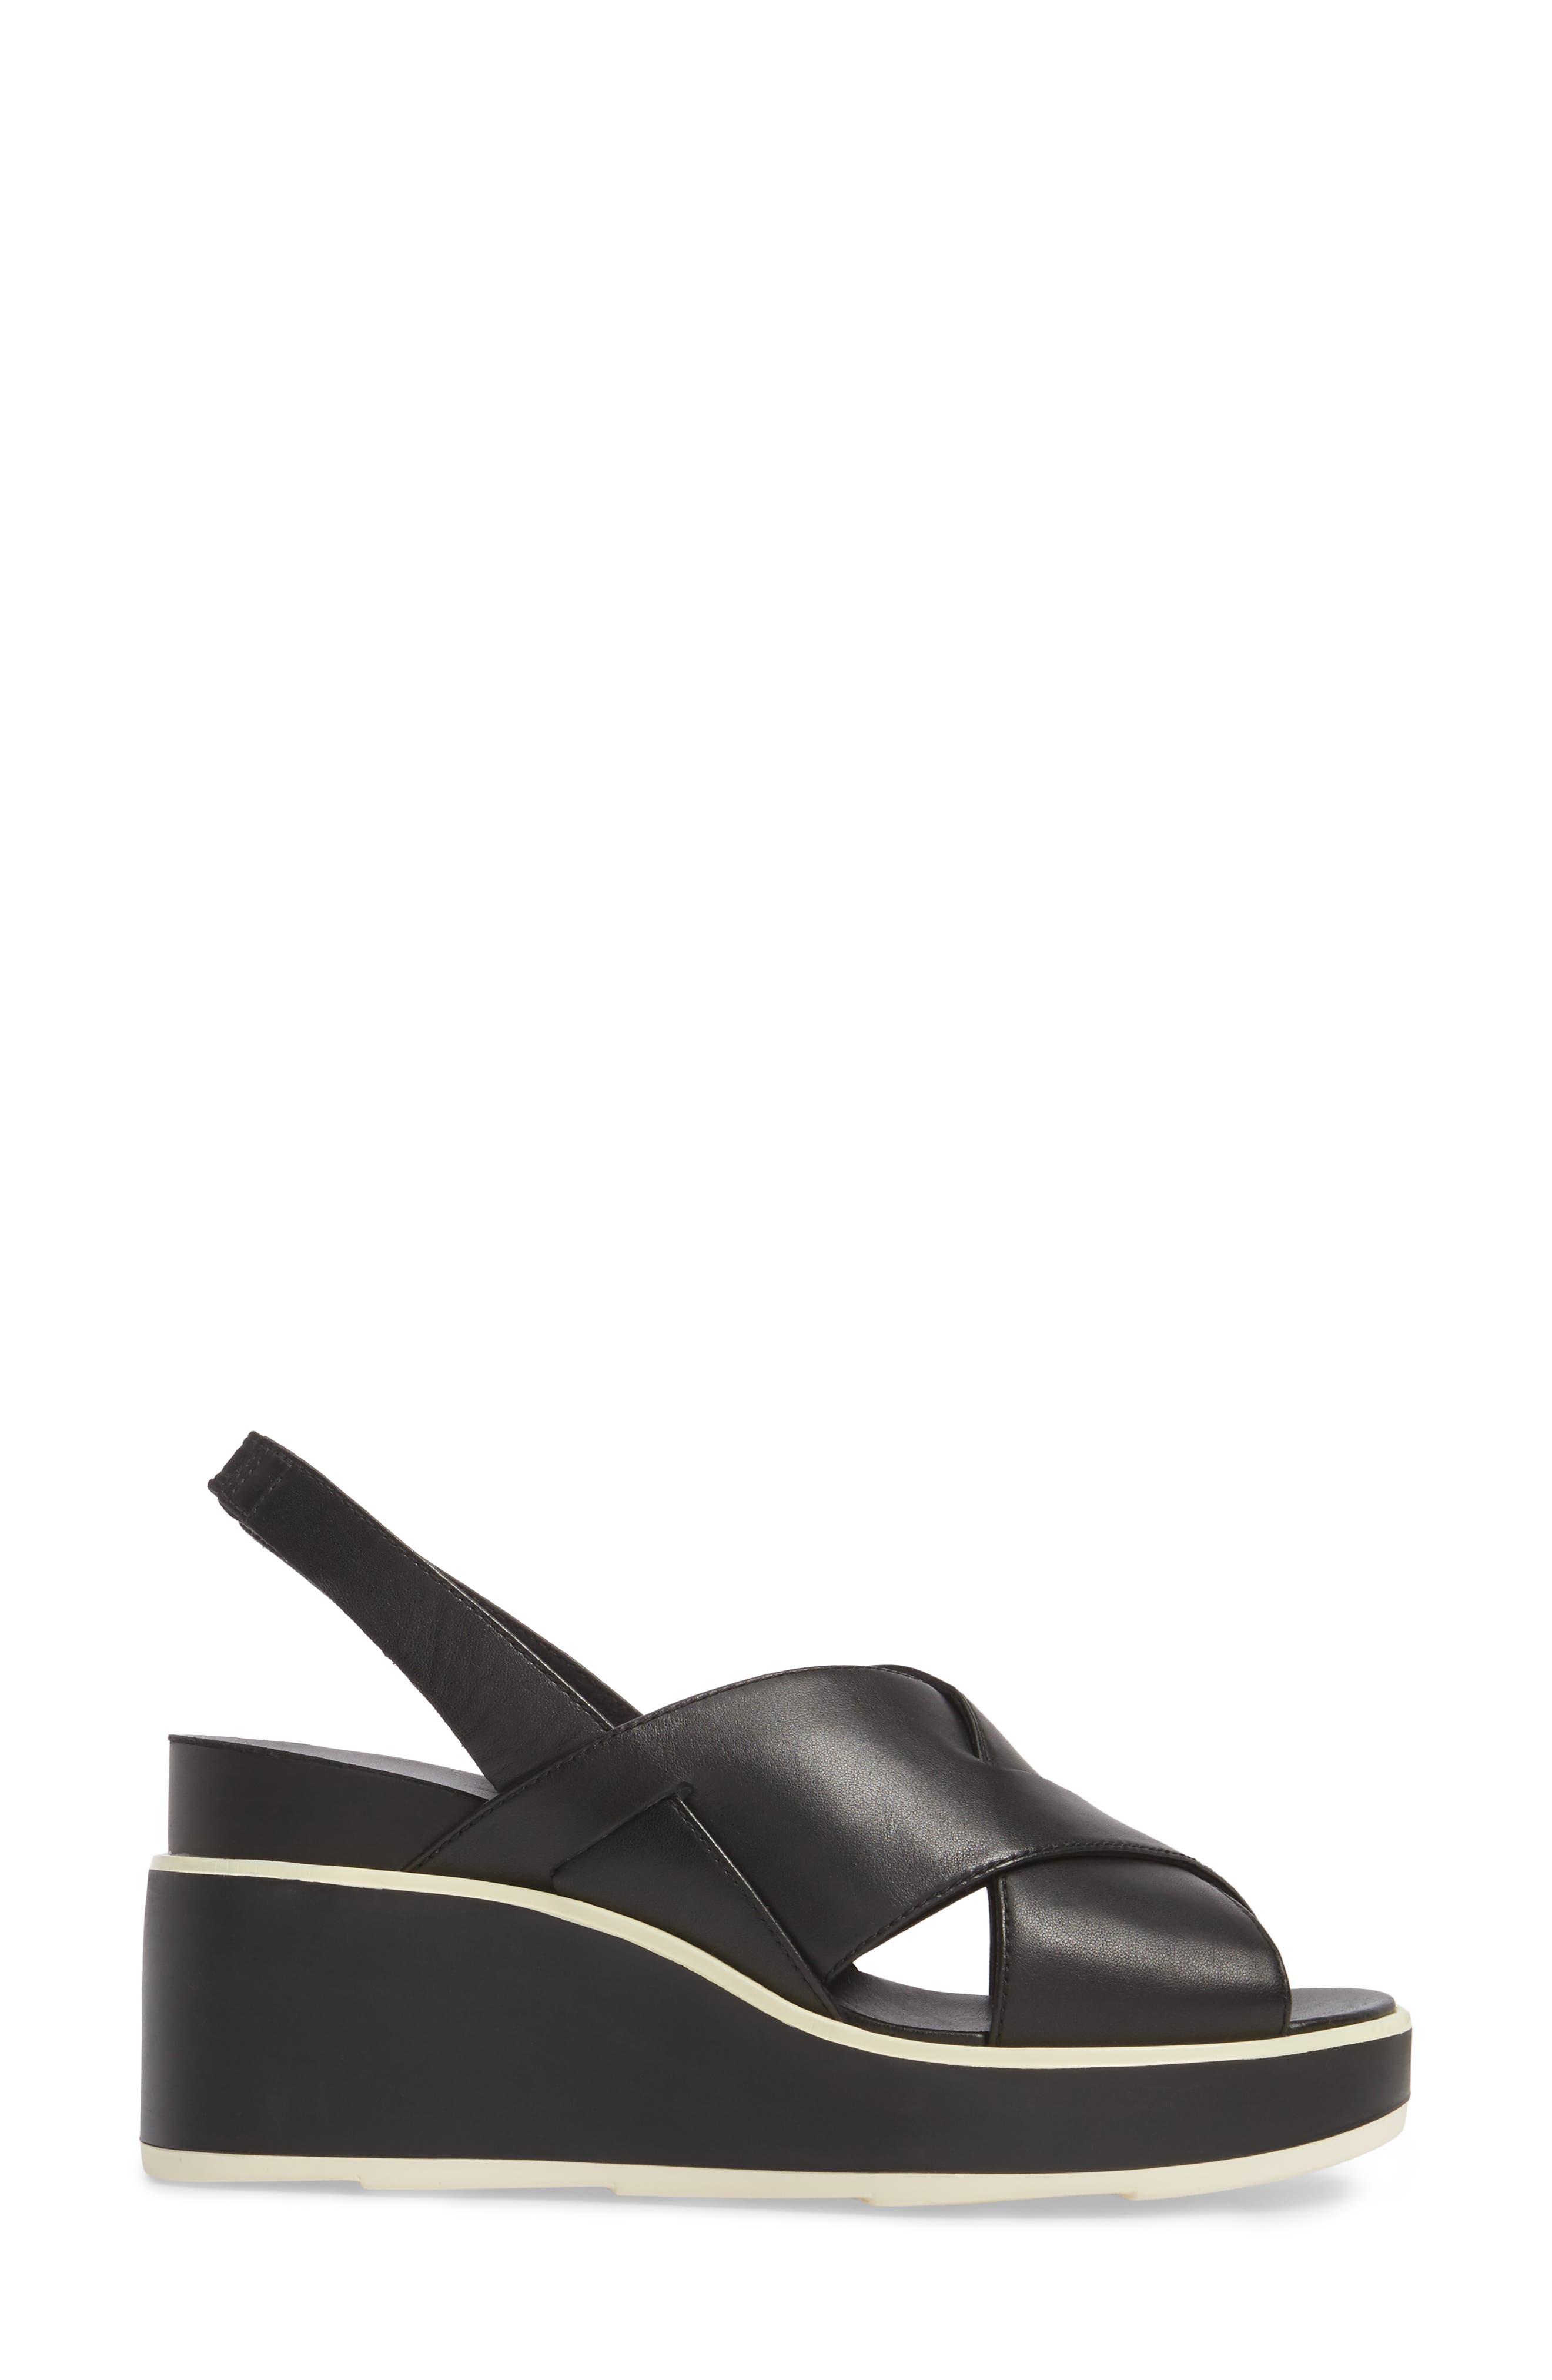 Tropik Cross Strap Wedge Sandal,                             Alternate thumbnail 3, color,                             BLACK LEATHER